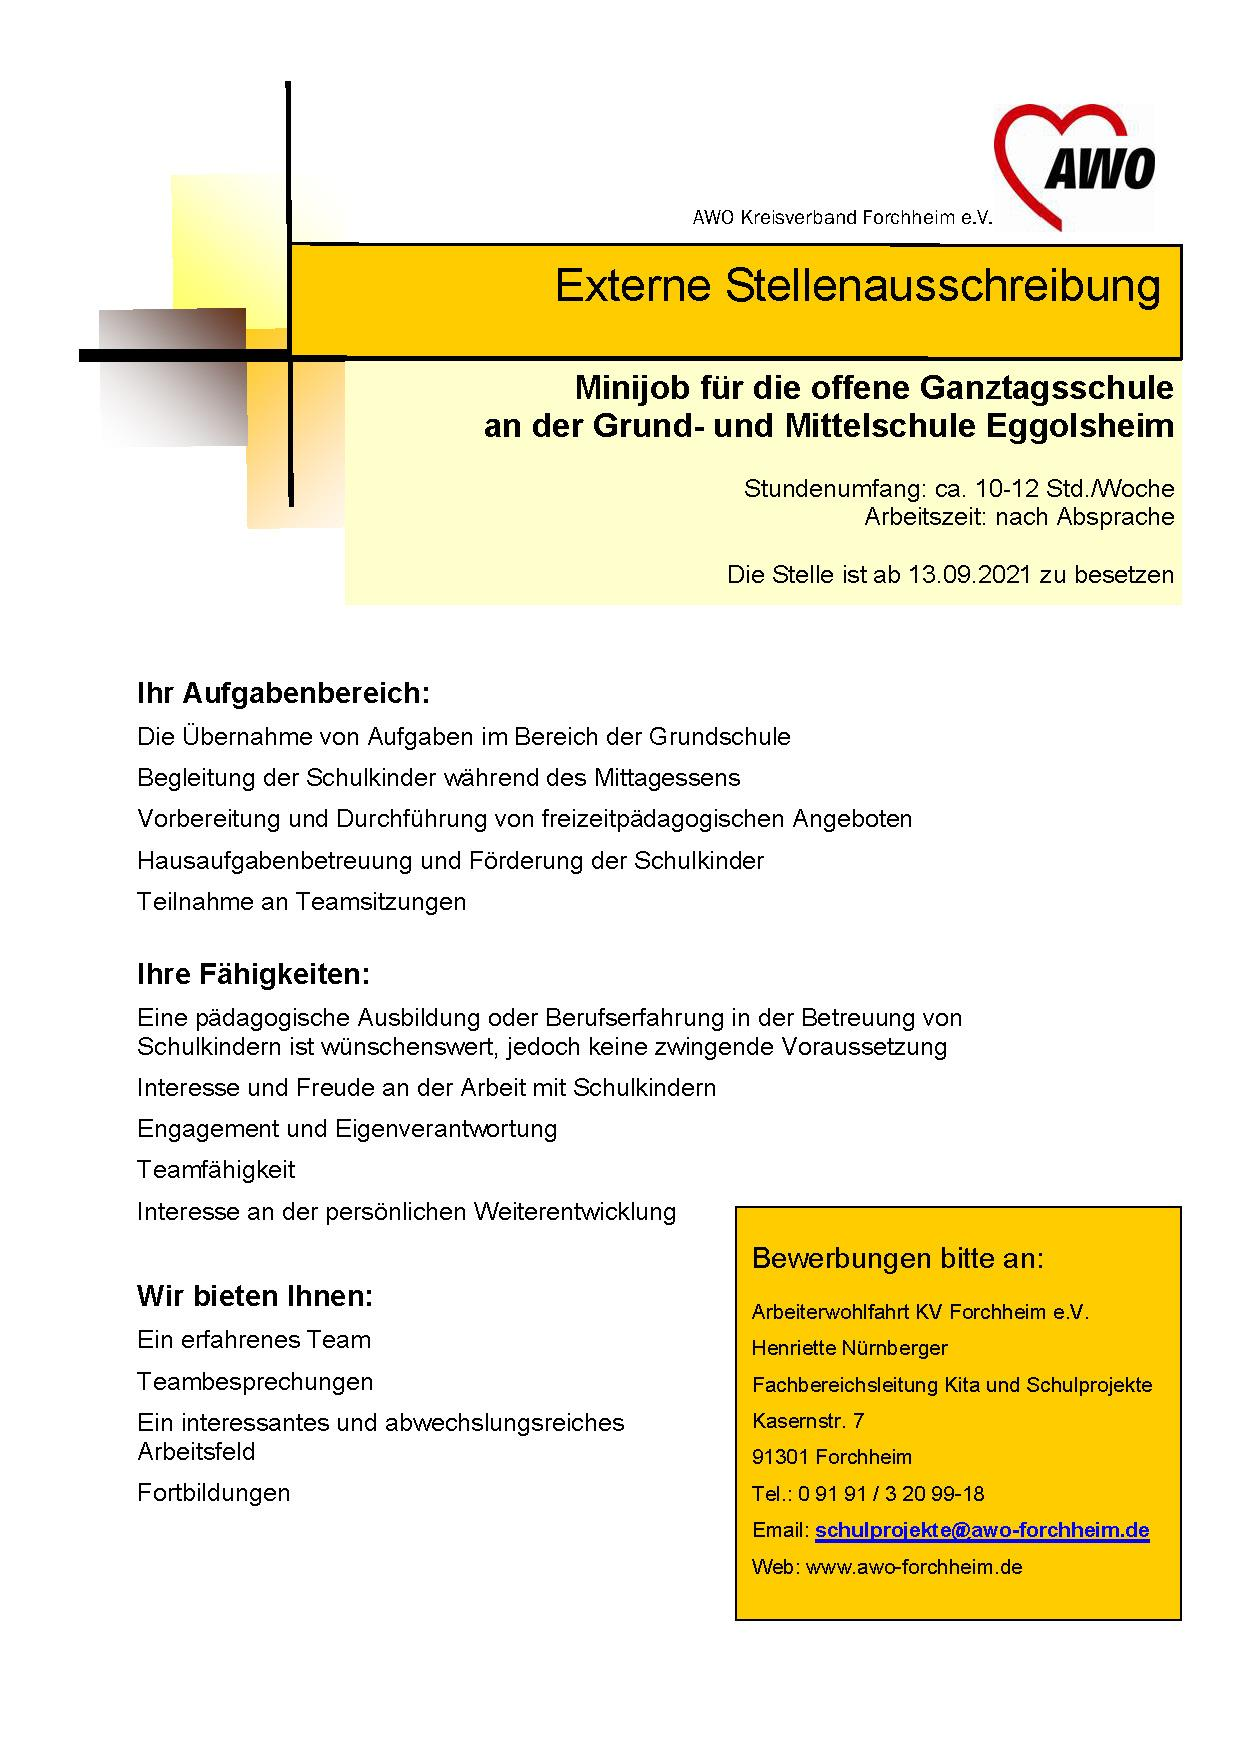 Eggolsheim Minijob ab 9.21